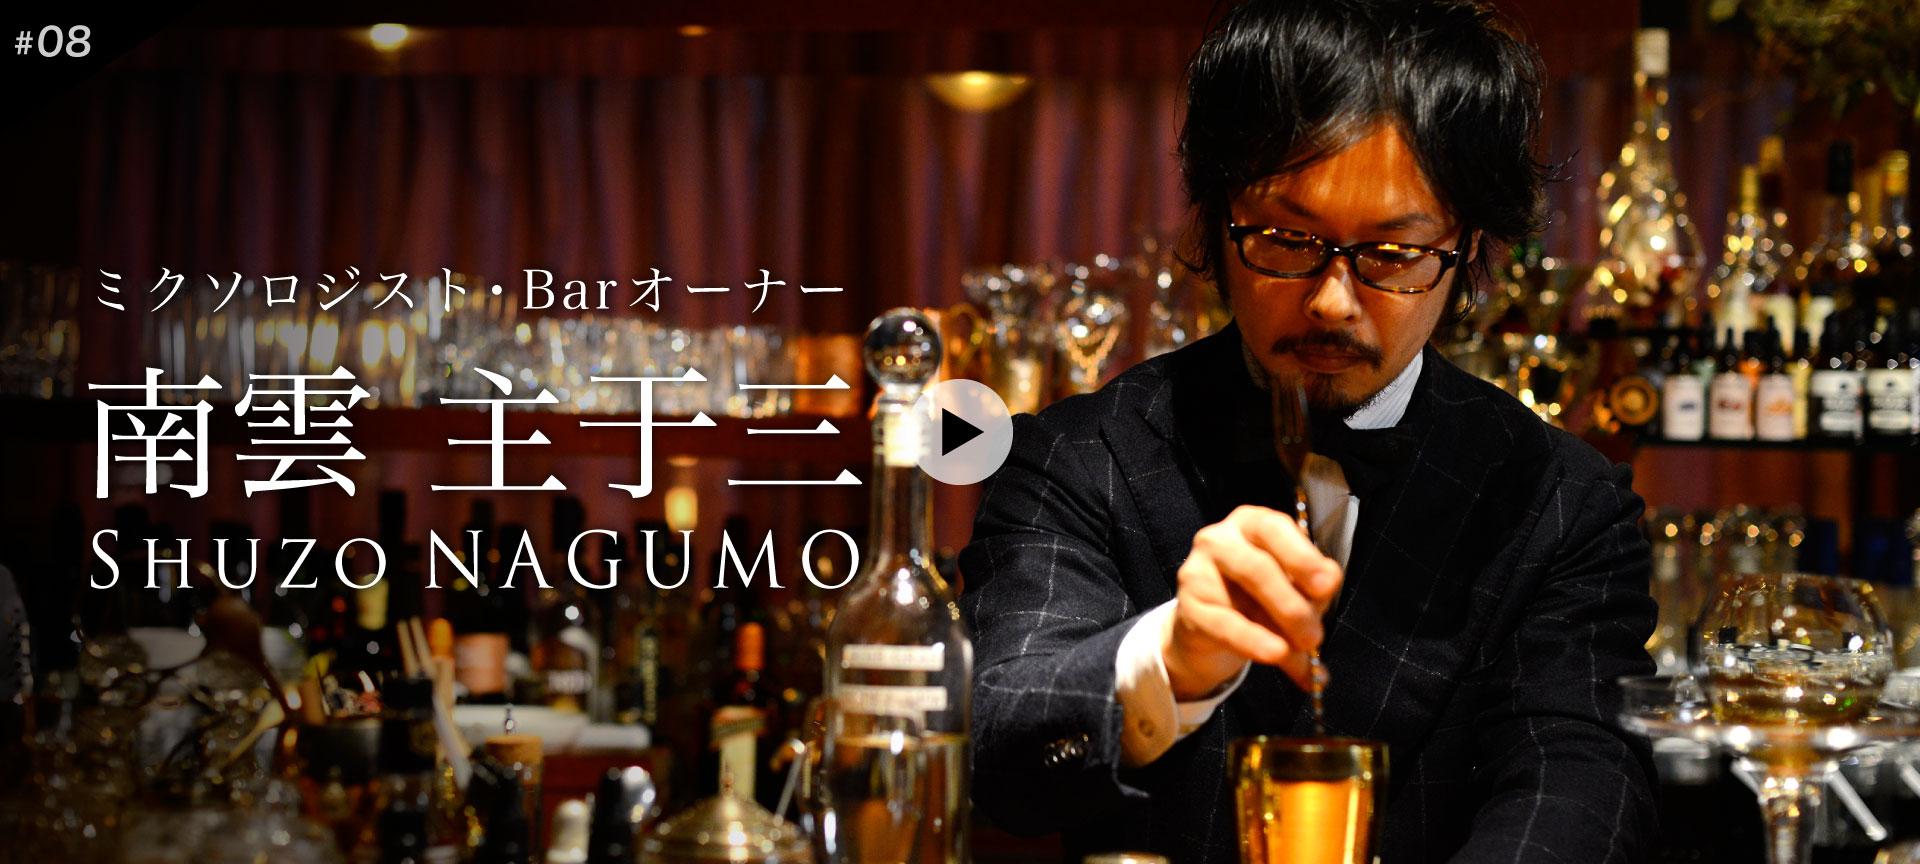 OWNDAYS MEETS 南雲 主于三(Nagumo Shuzo)